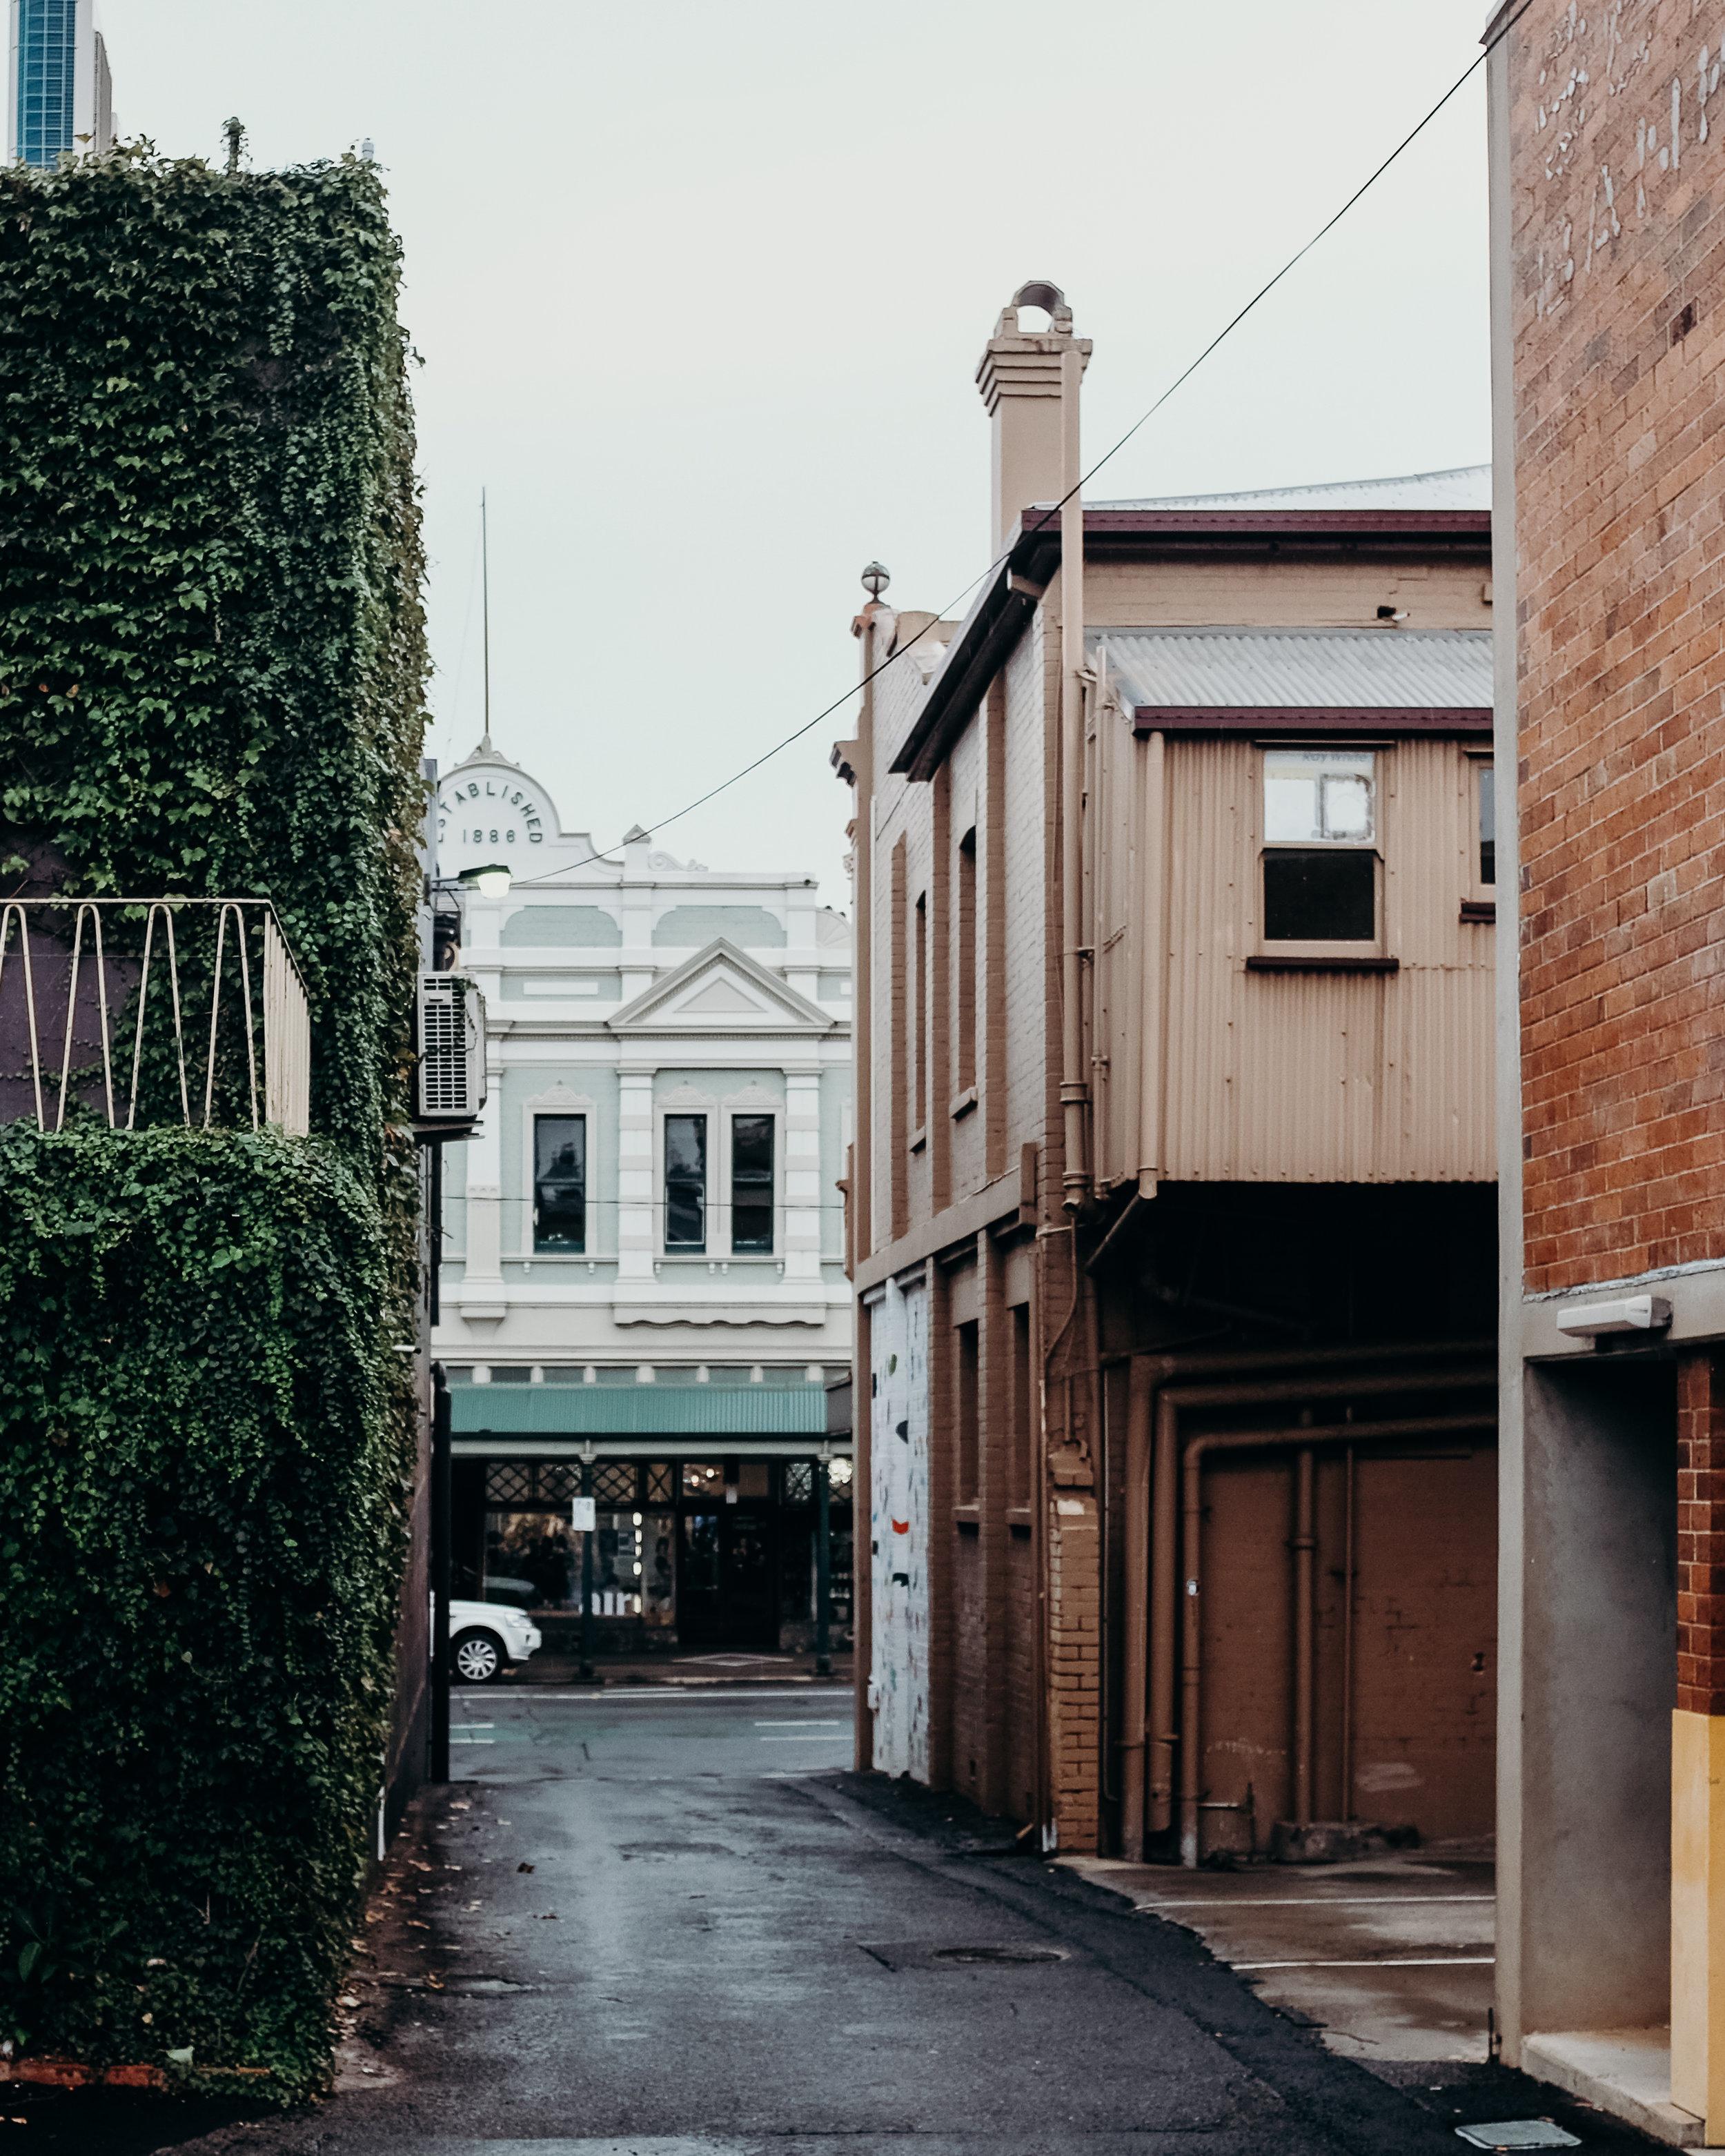 Streets & Lanes (7 of 9).jpg